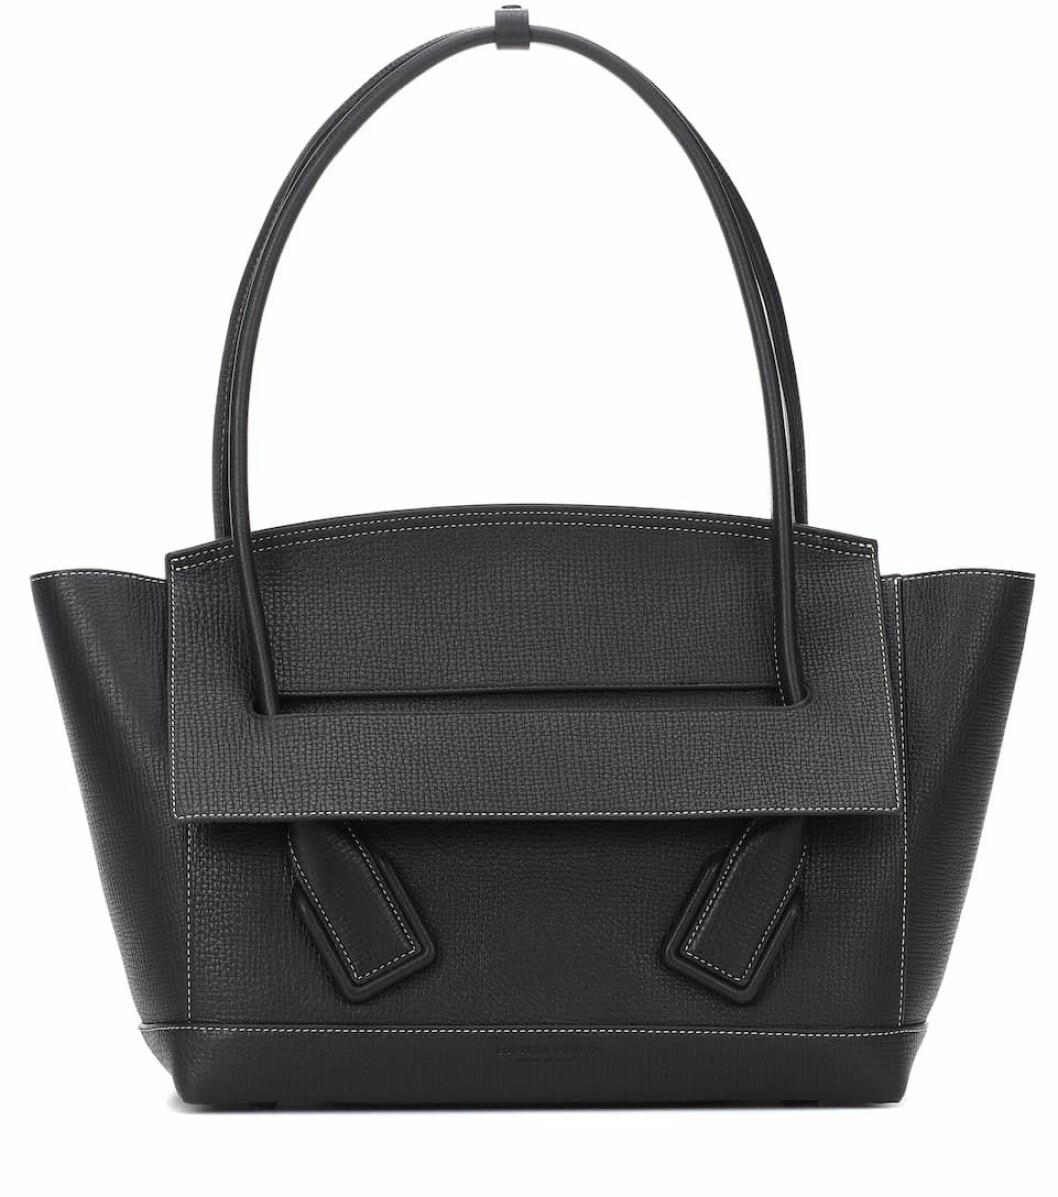 Bottega Veneta svart väska.